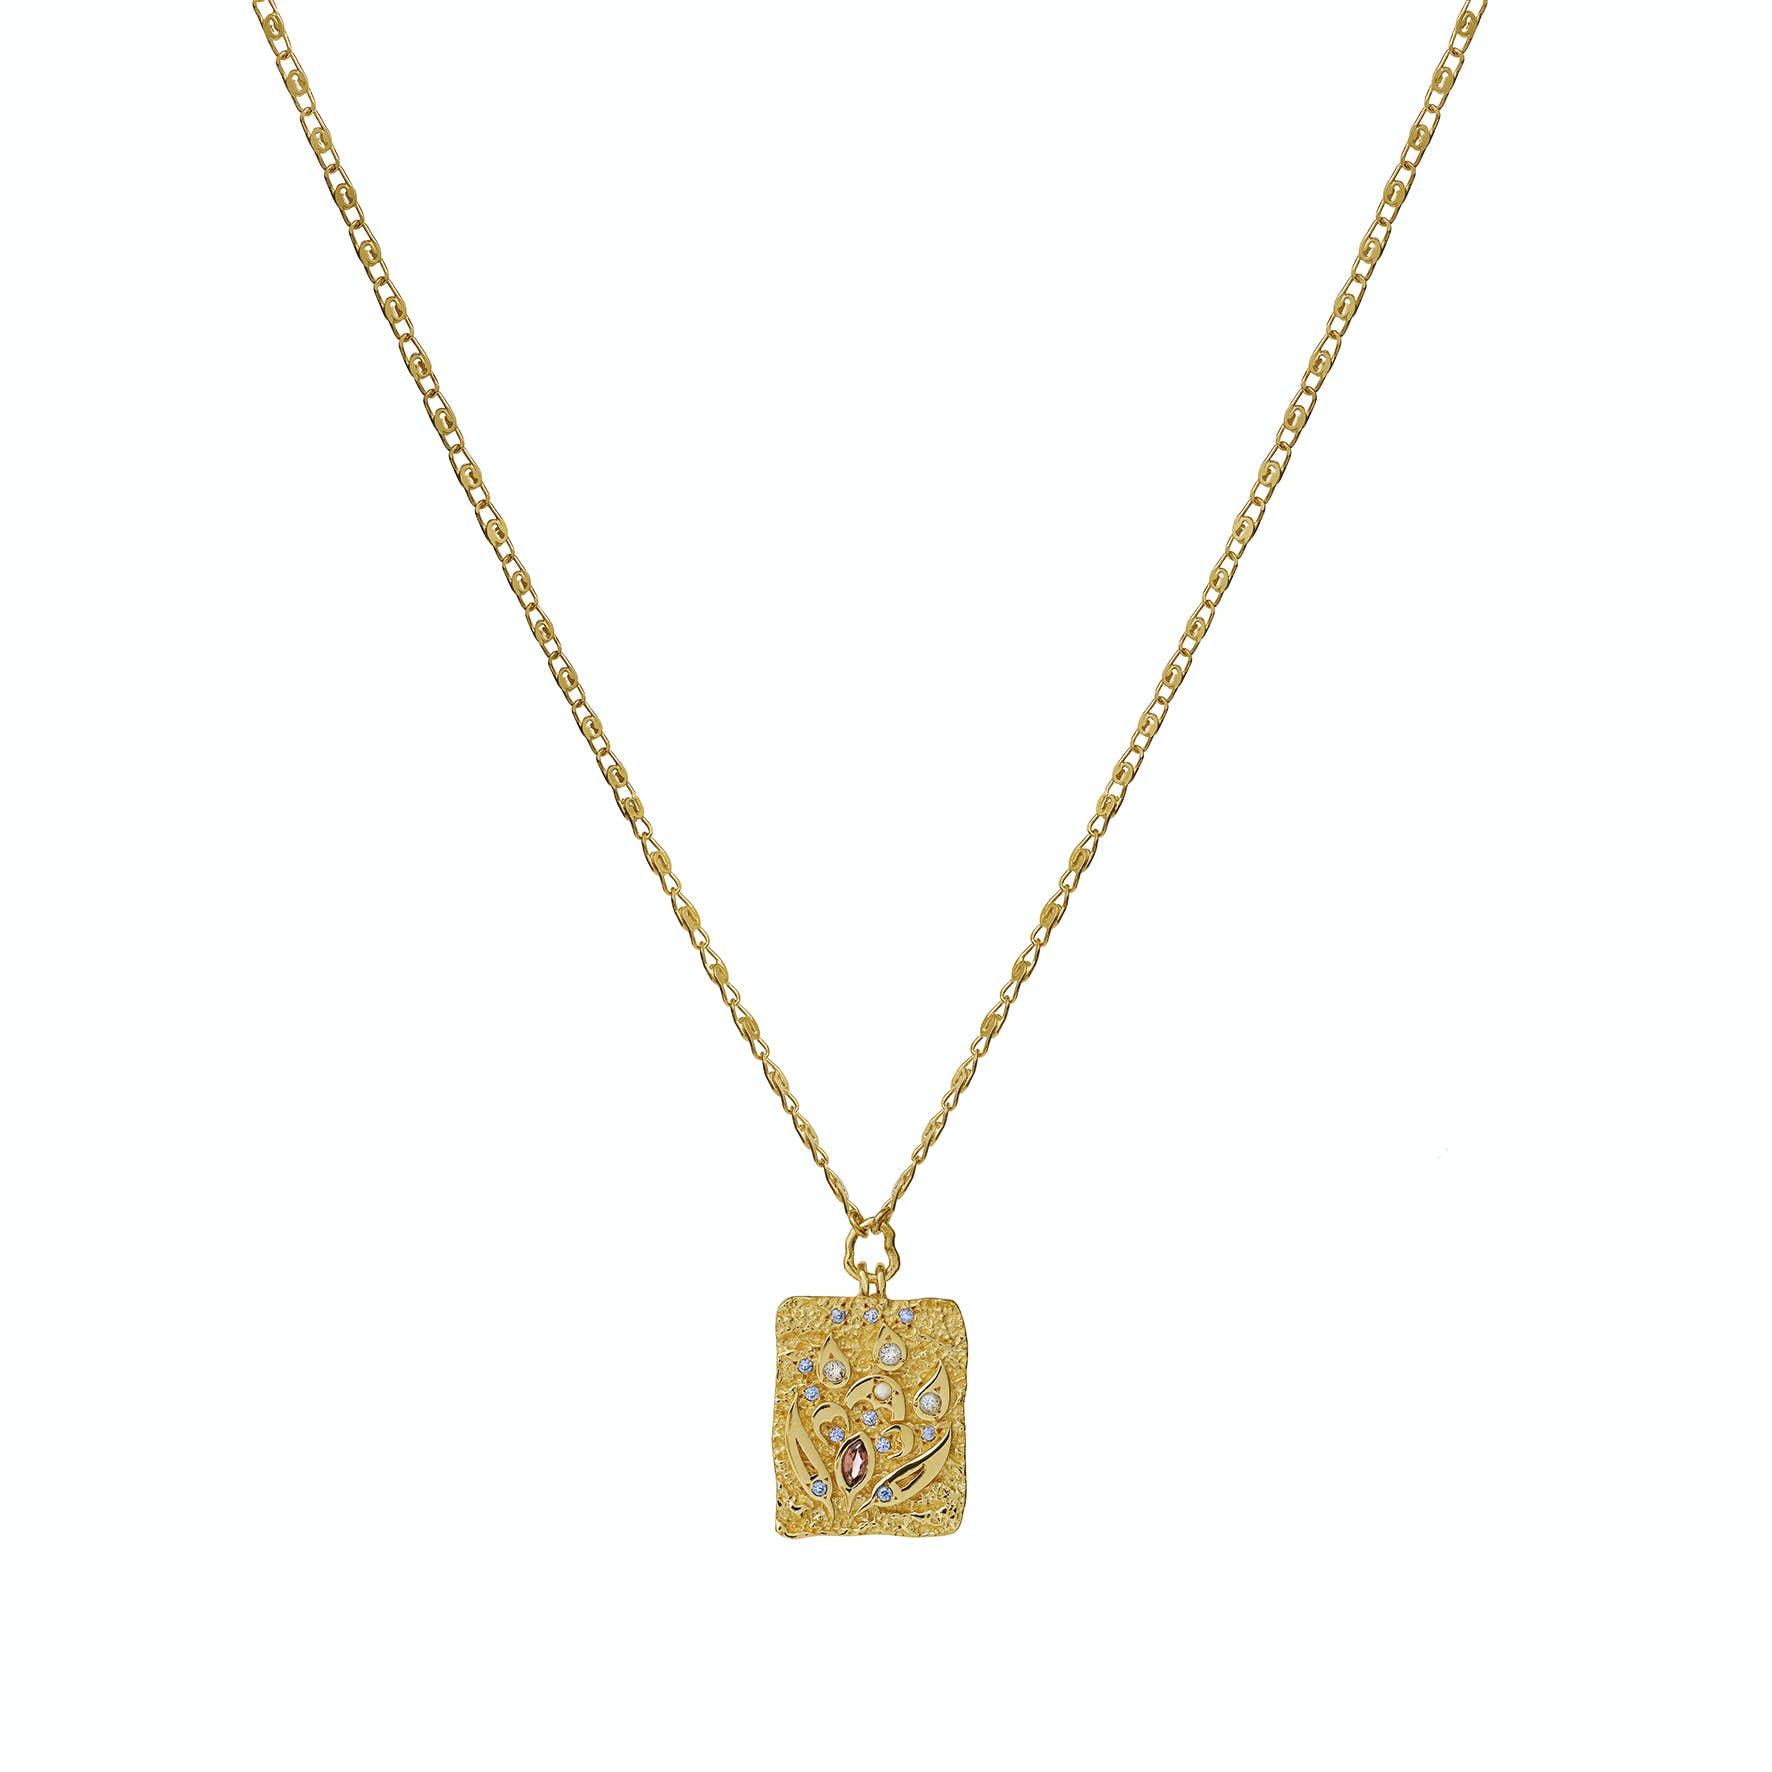 Fleur Necklace fra Maanesten i Forgylt-Sølv Sterling 925